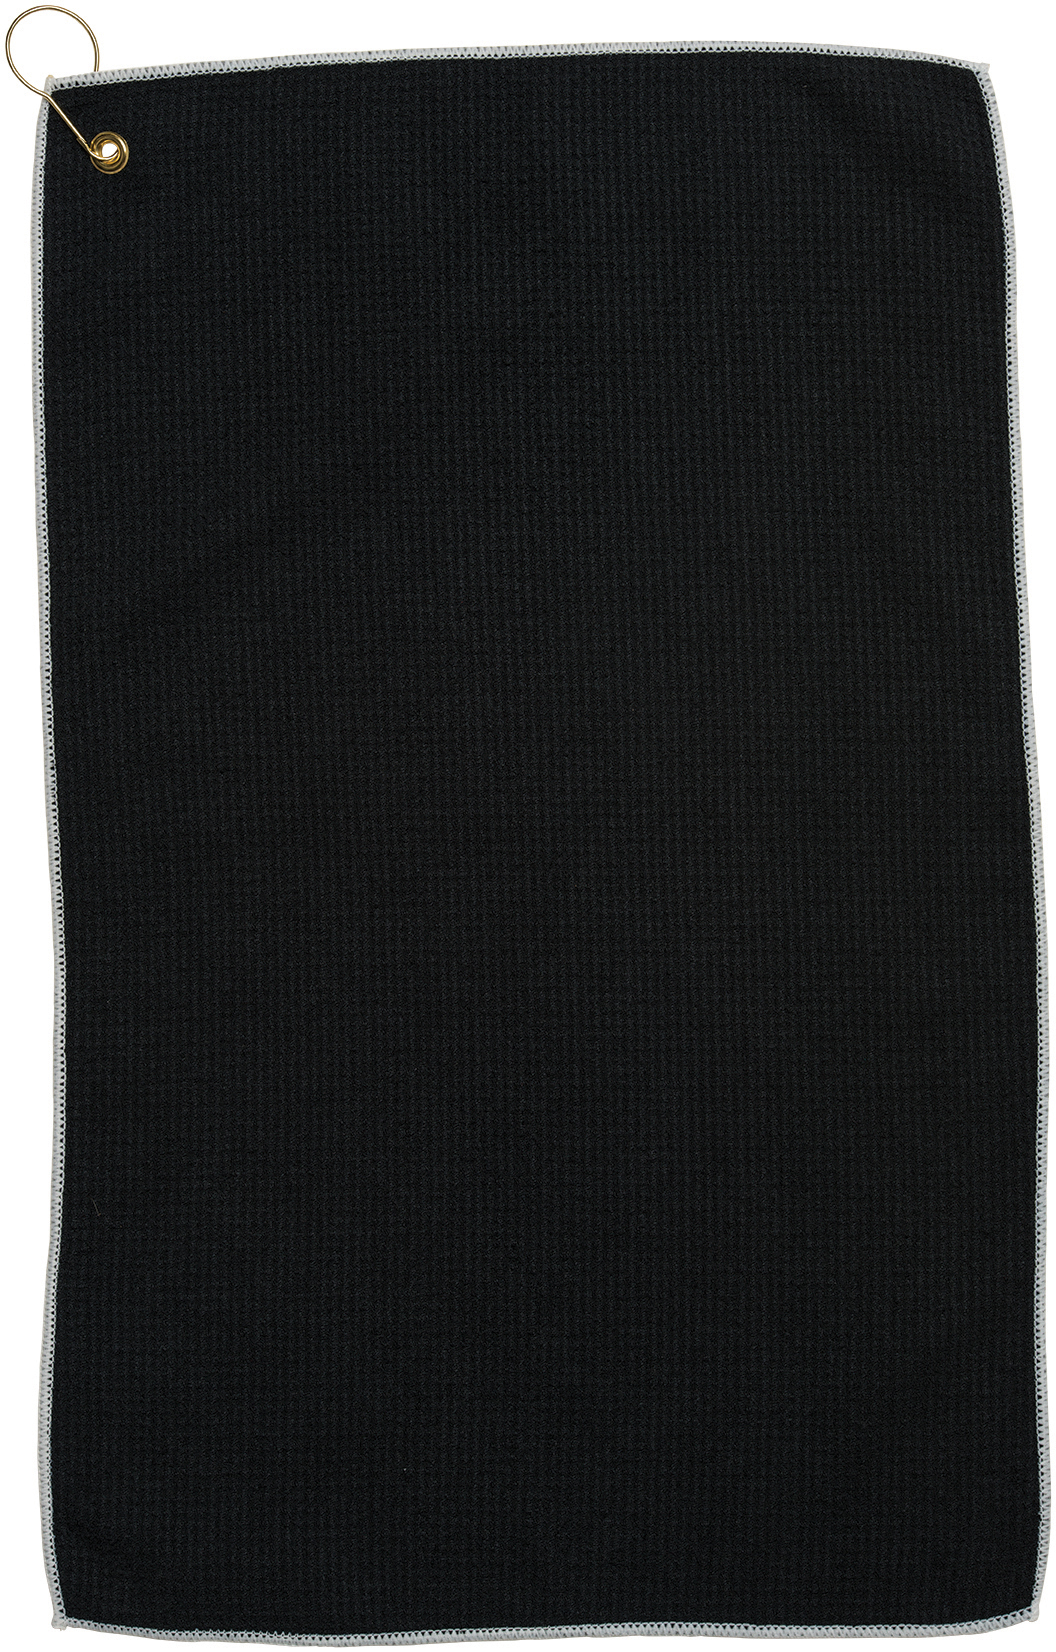 MW-26CG-BLACK